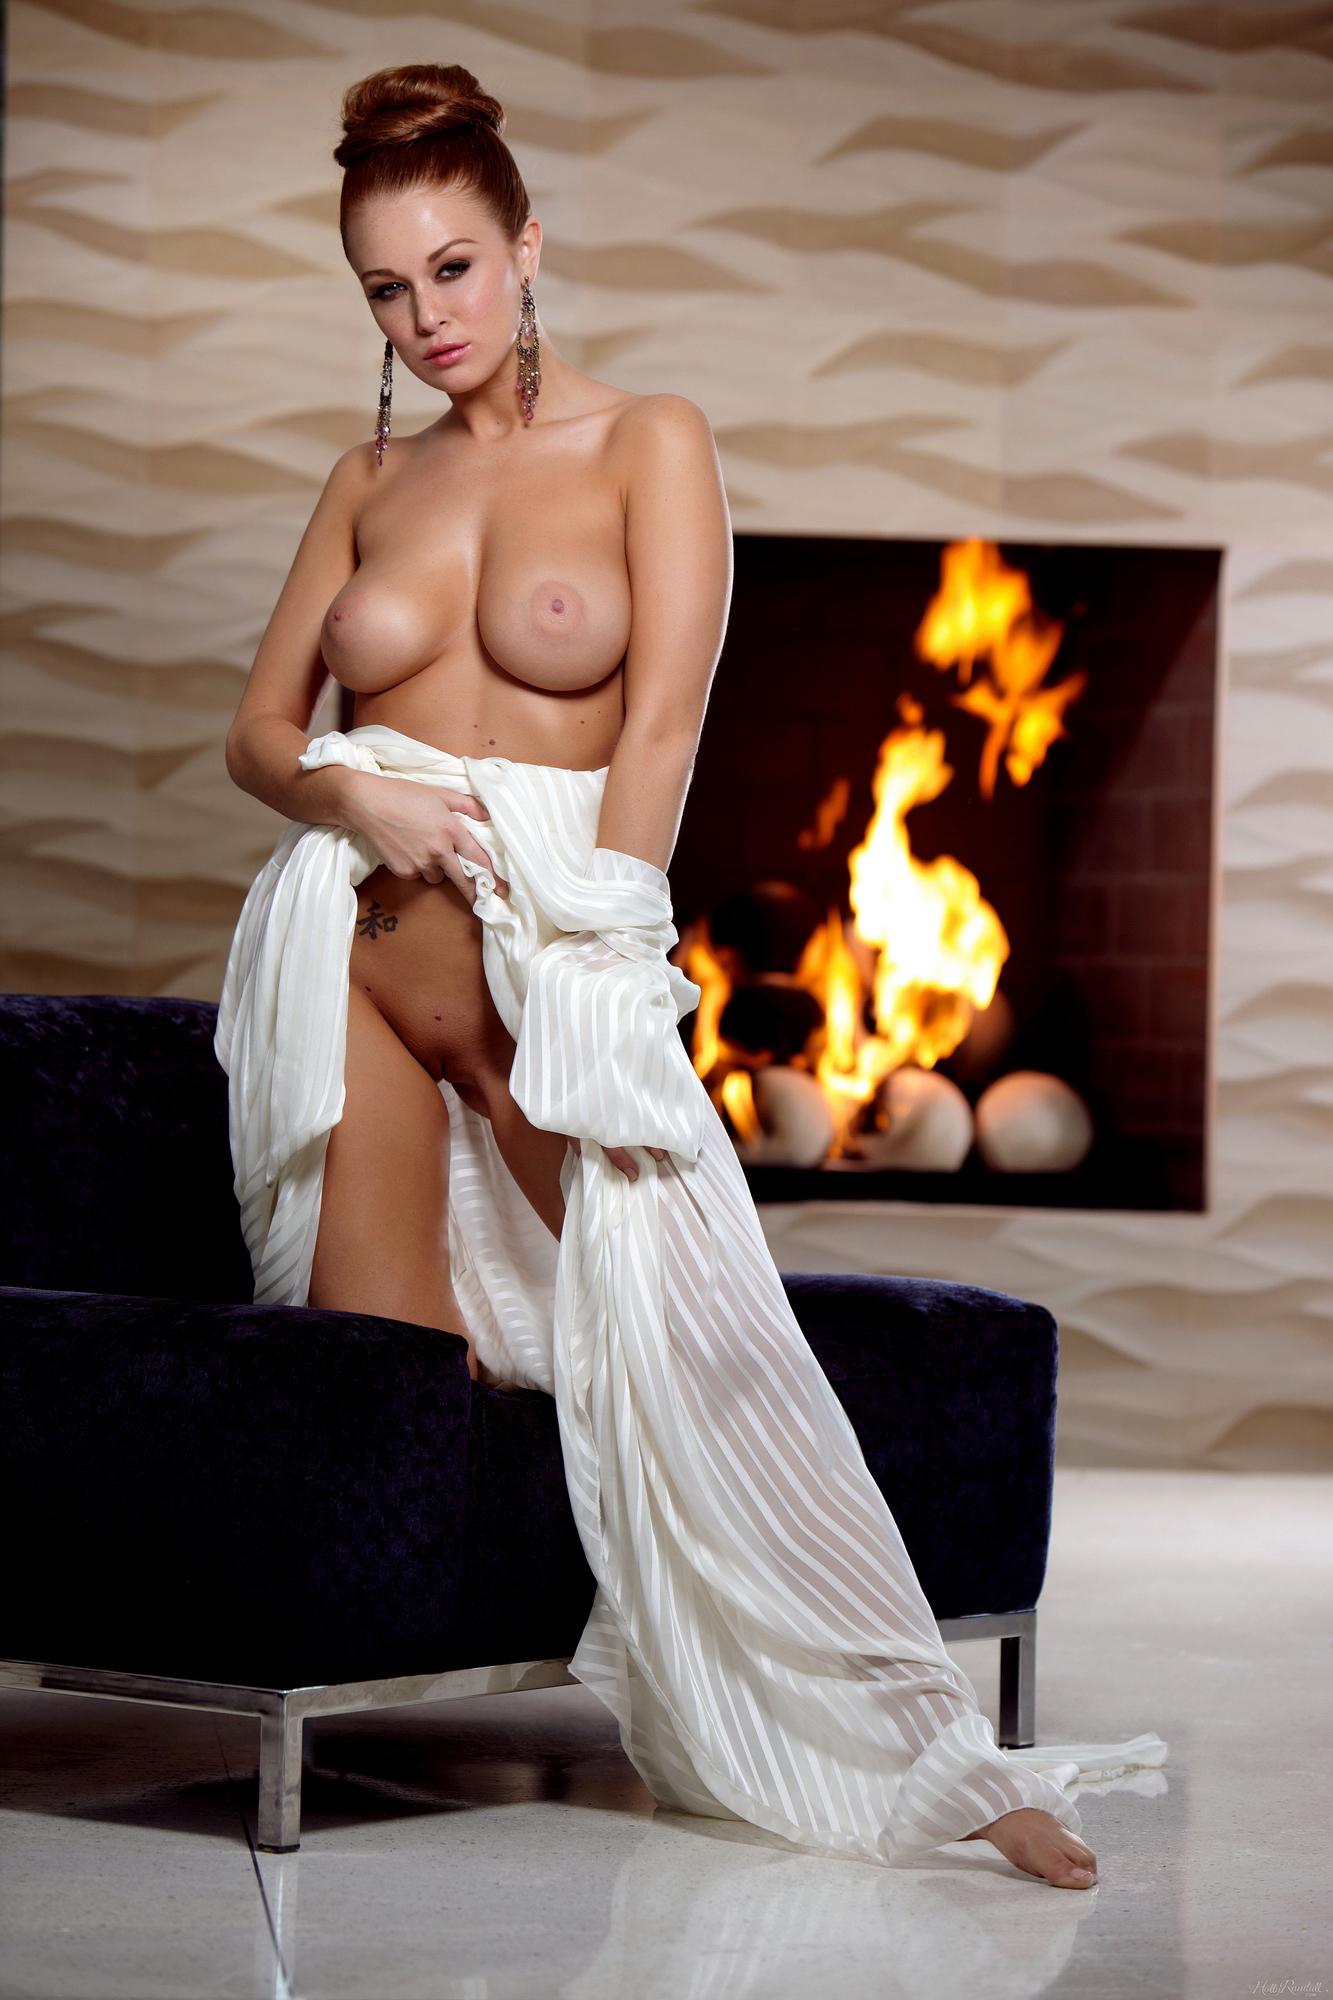 leanna-decker-nude-fireplace-redhead-hollyrandall-09